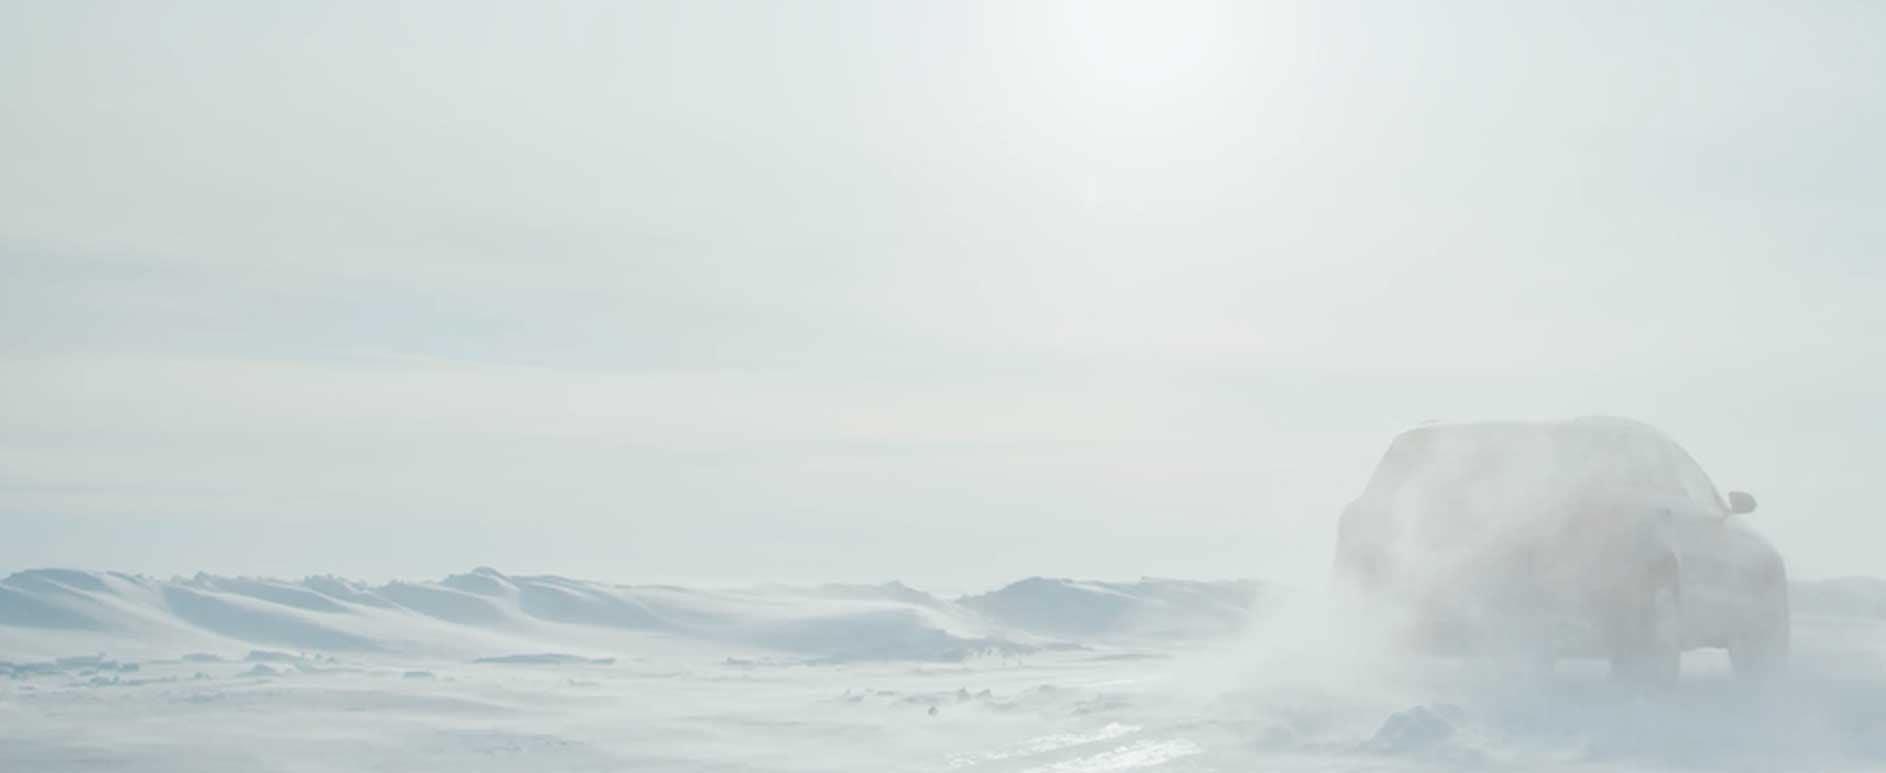 2021_01_1886x773px_arctic_glc_v2